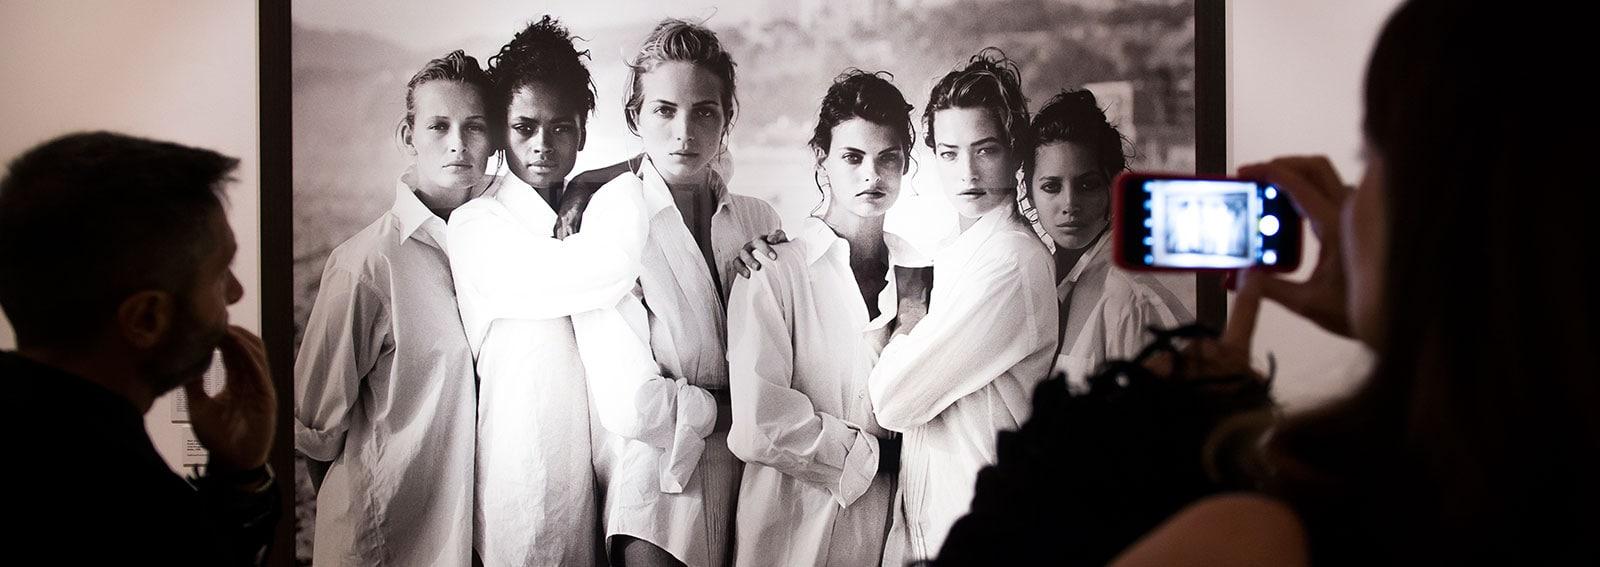 Le Top Model in Bianco e Nero di Peter Lindbergh